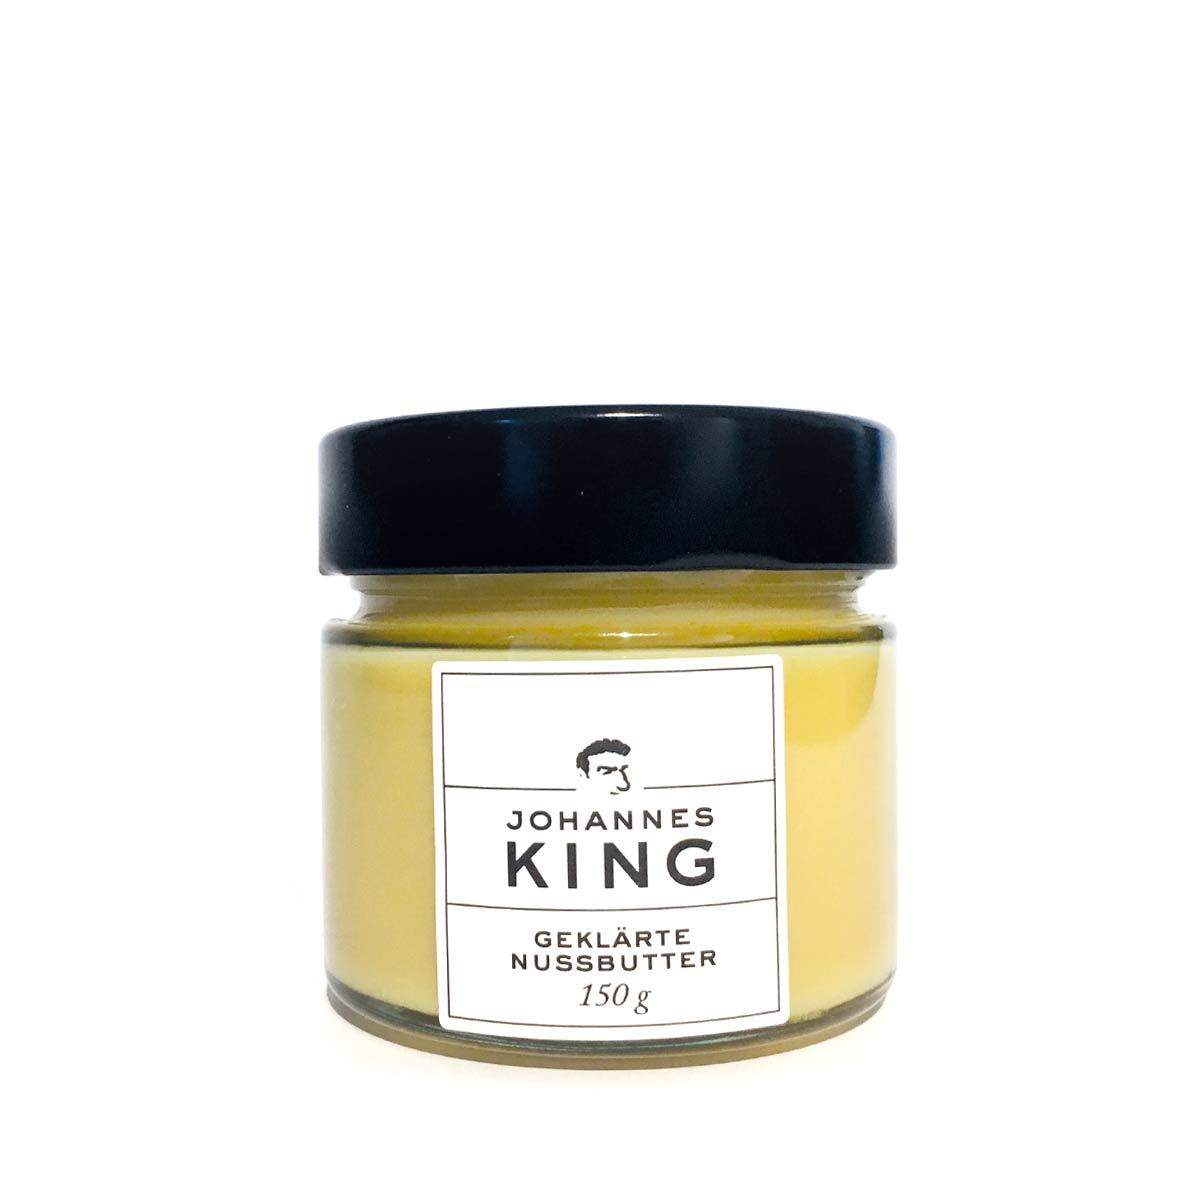 Kings Grillabend für Feinschmecker